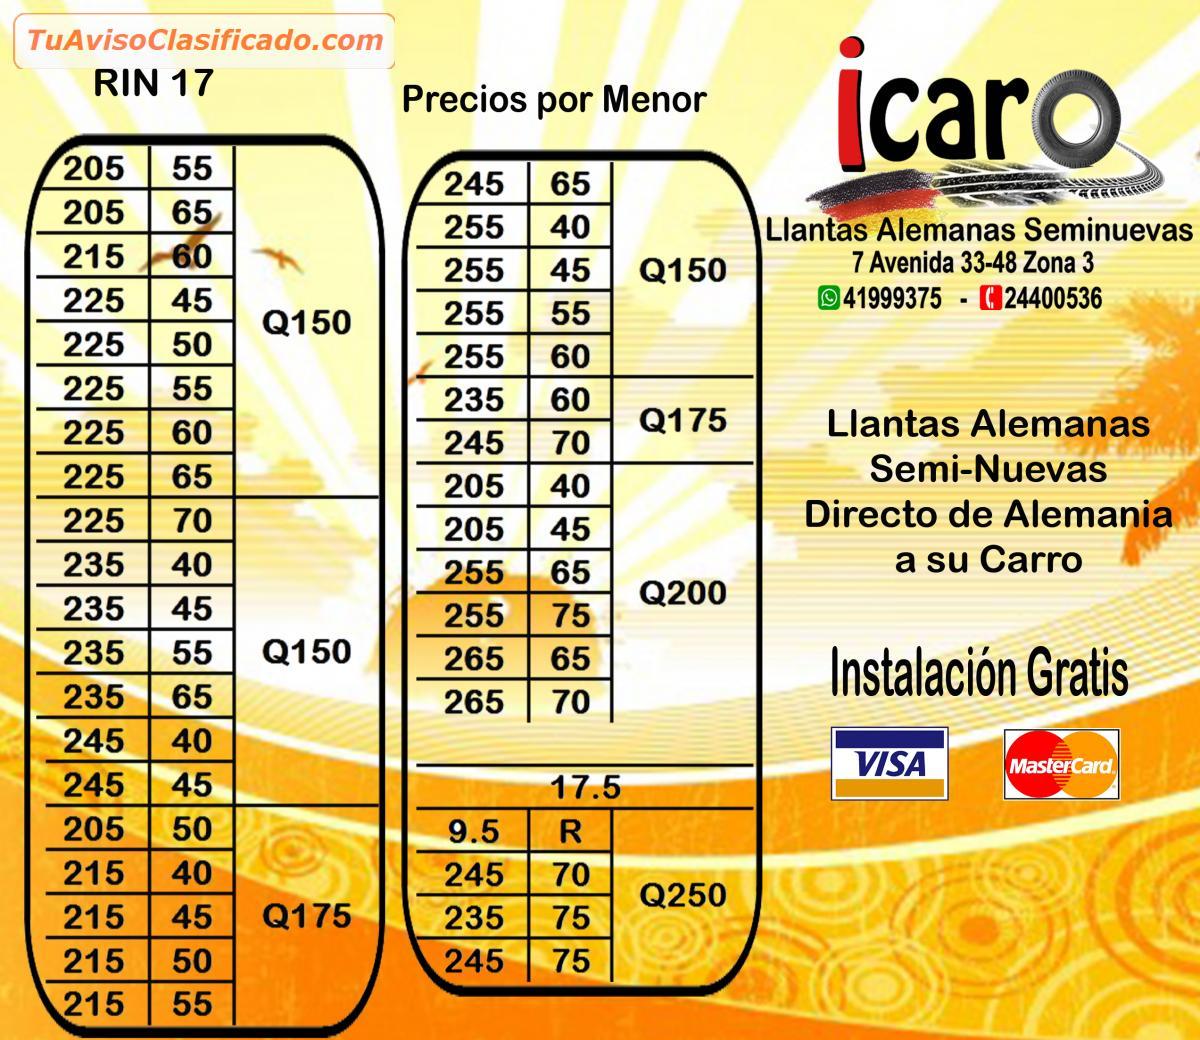 llantas usadas en espana: